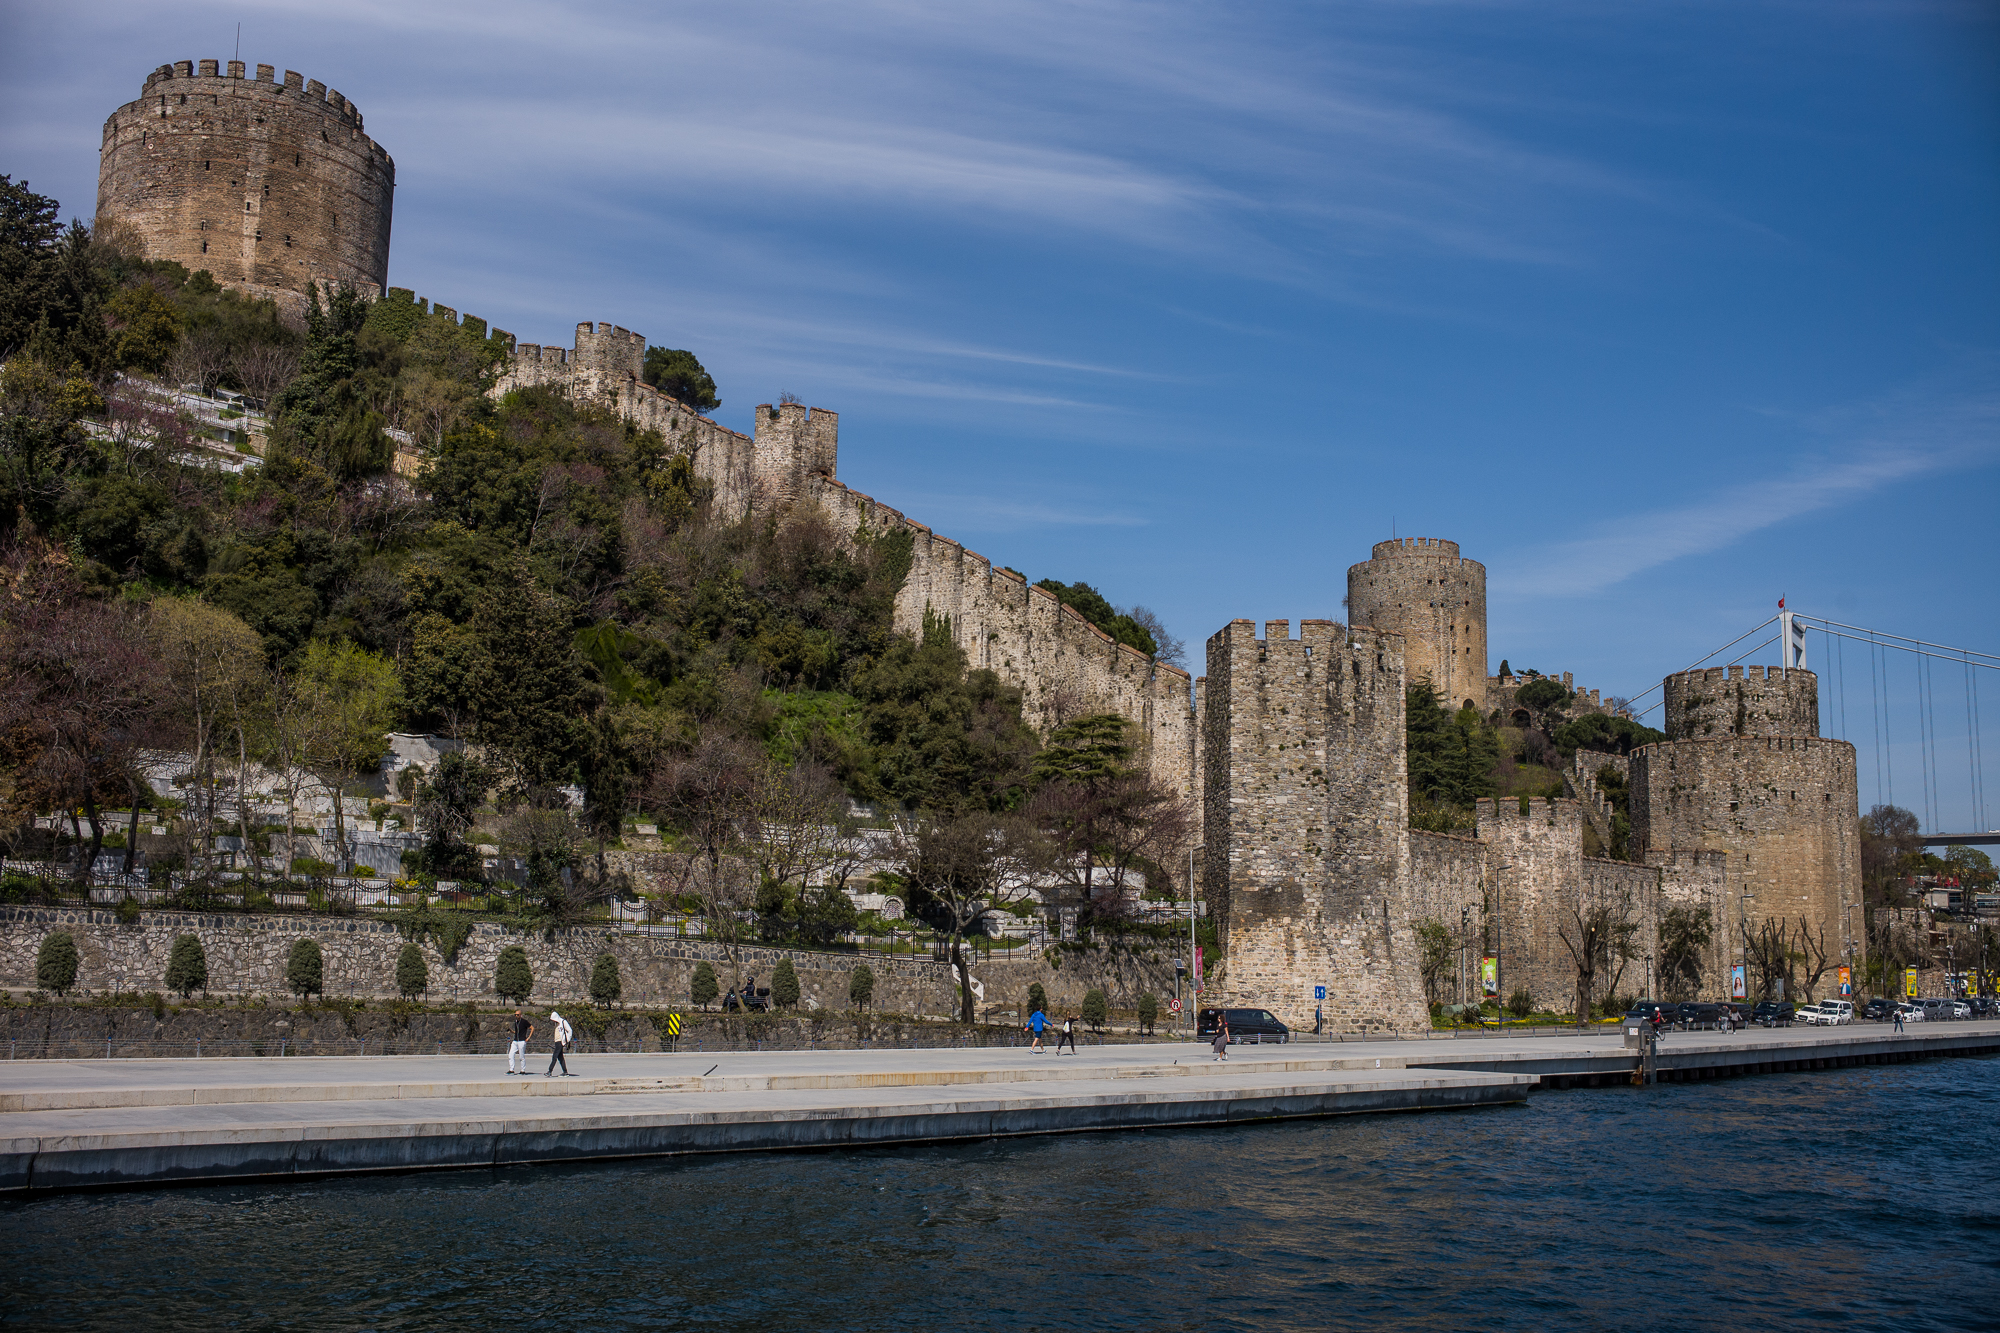 The Rumelihisari Fortress built by Mehmet the Conqueror